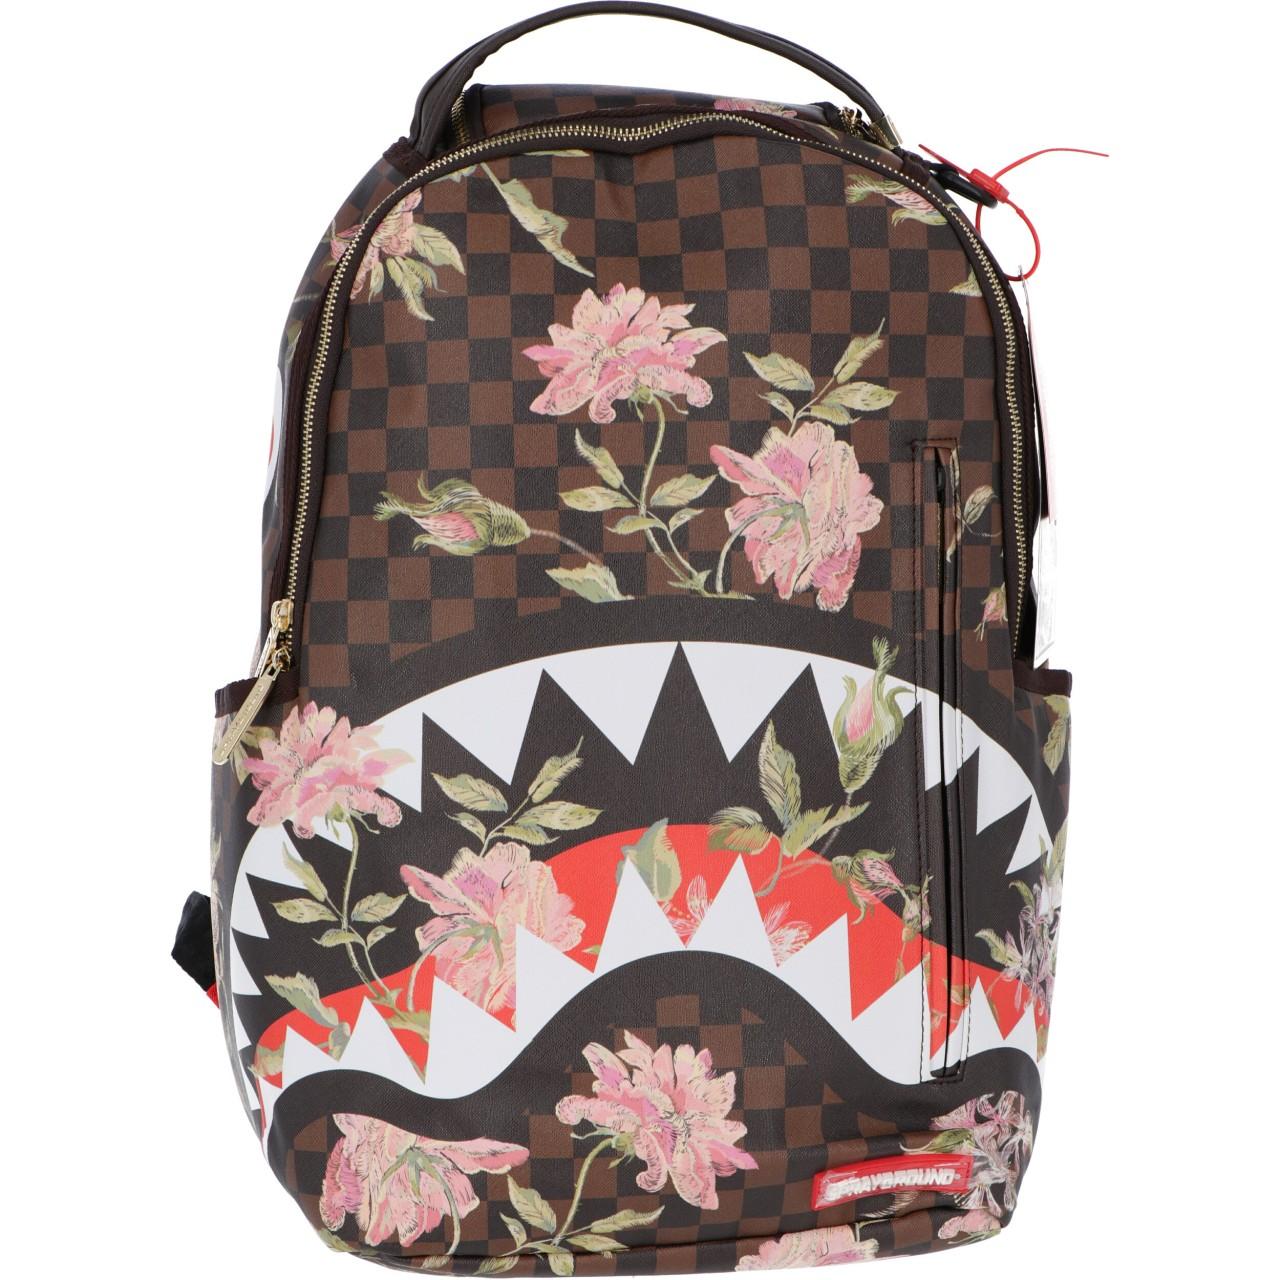 Sprayground Uomo Zaino Sprayground Shark Flower Backpack 2975O